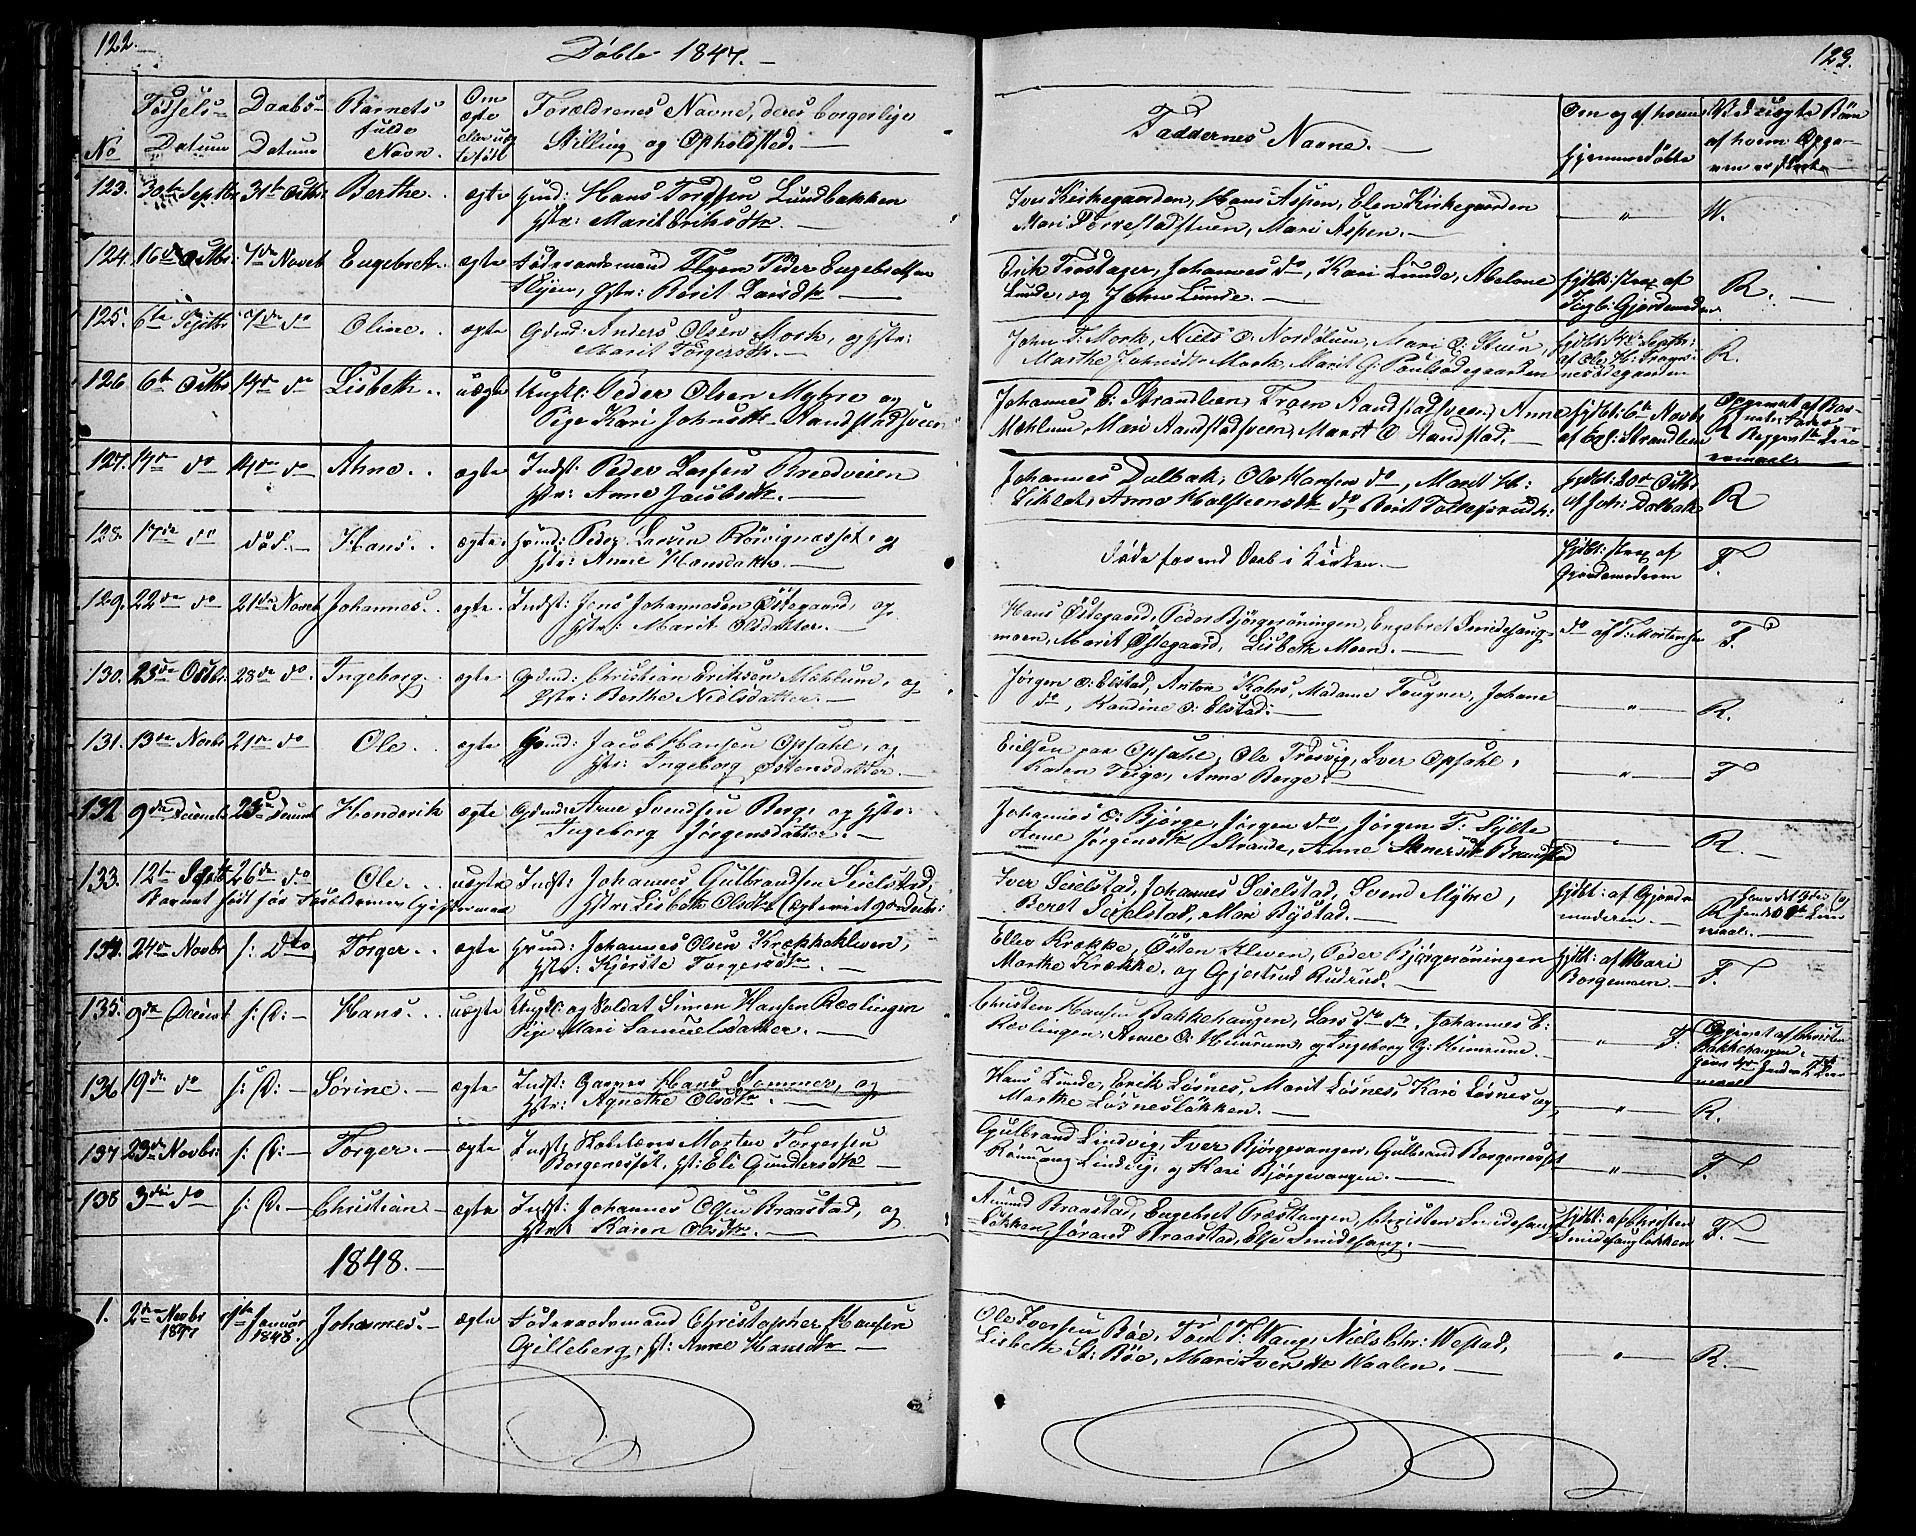 SAH, Ringebu prestekontor, Klokkerbok nr. 2, 1839-1853, s. 122-123